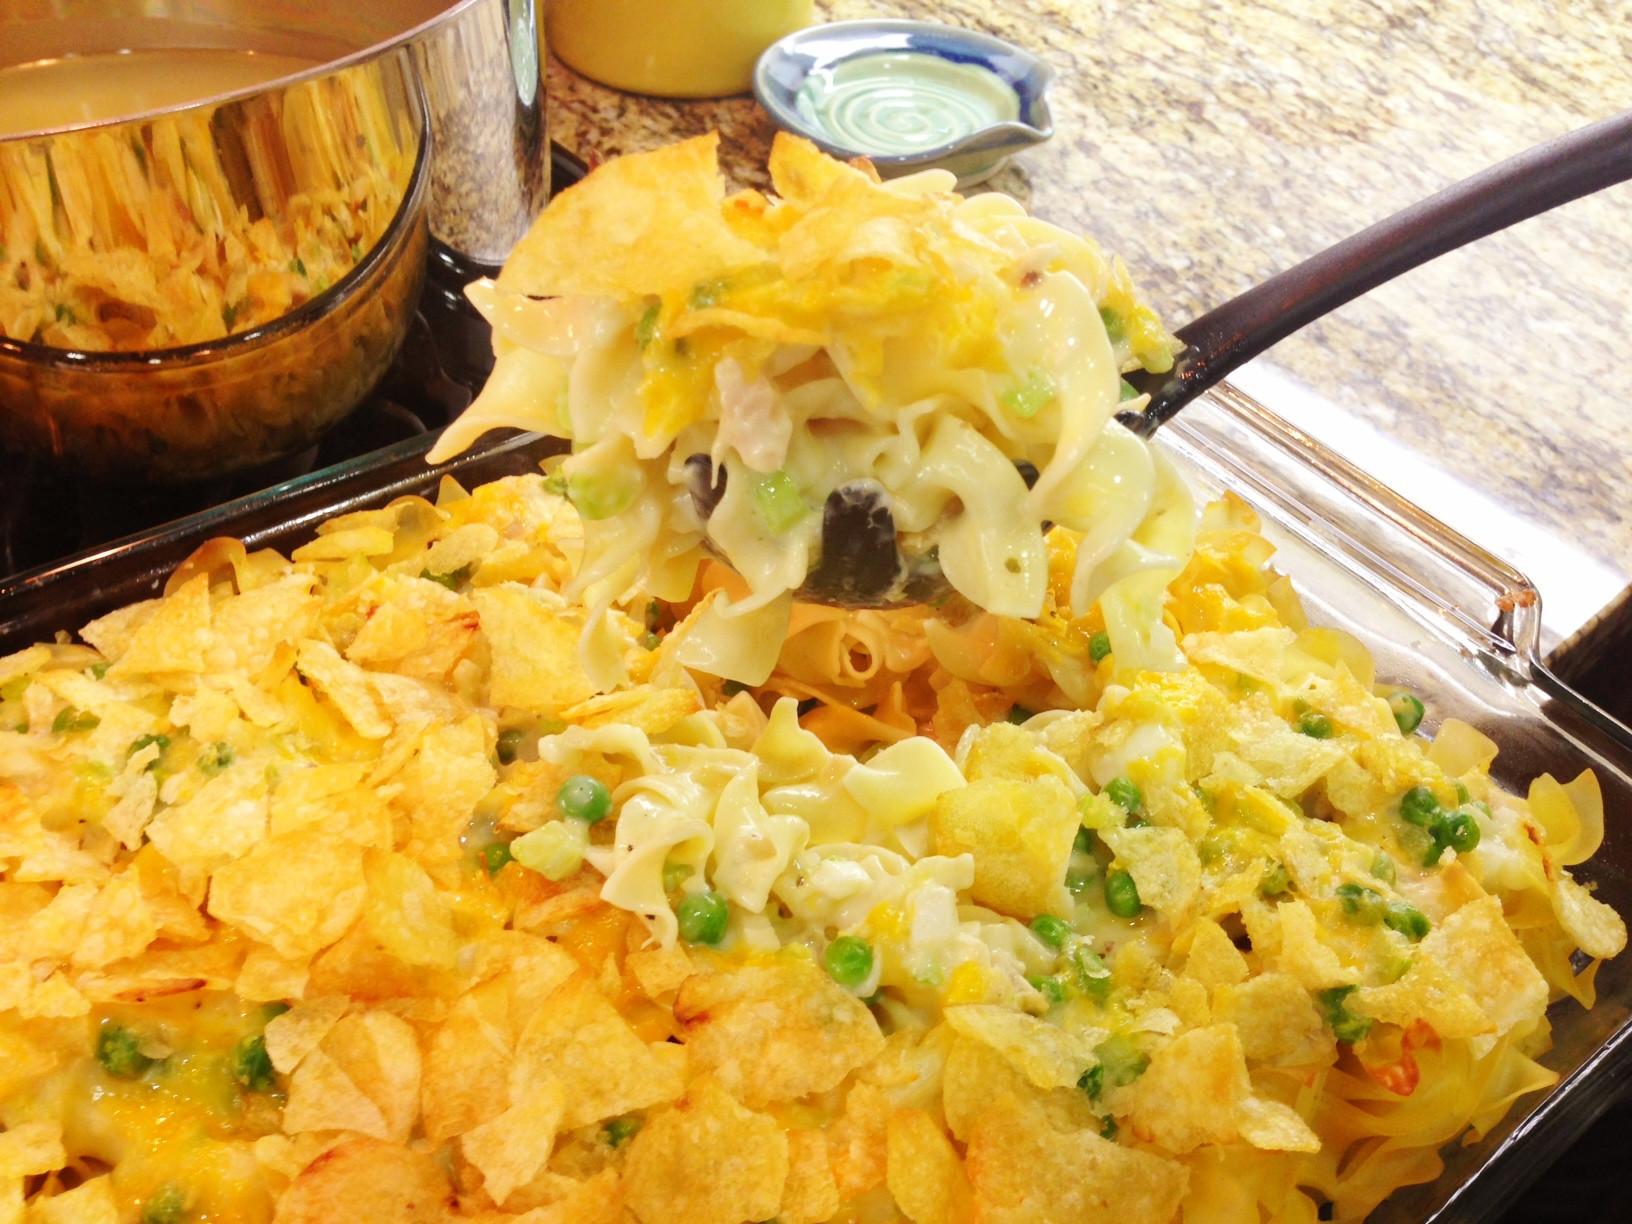 Tuna Casserole With Chips  Cooking Tuna Noodle Casserole Recipe